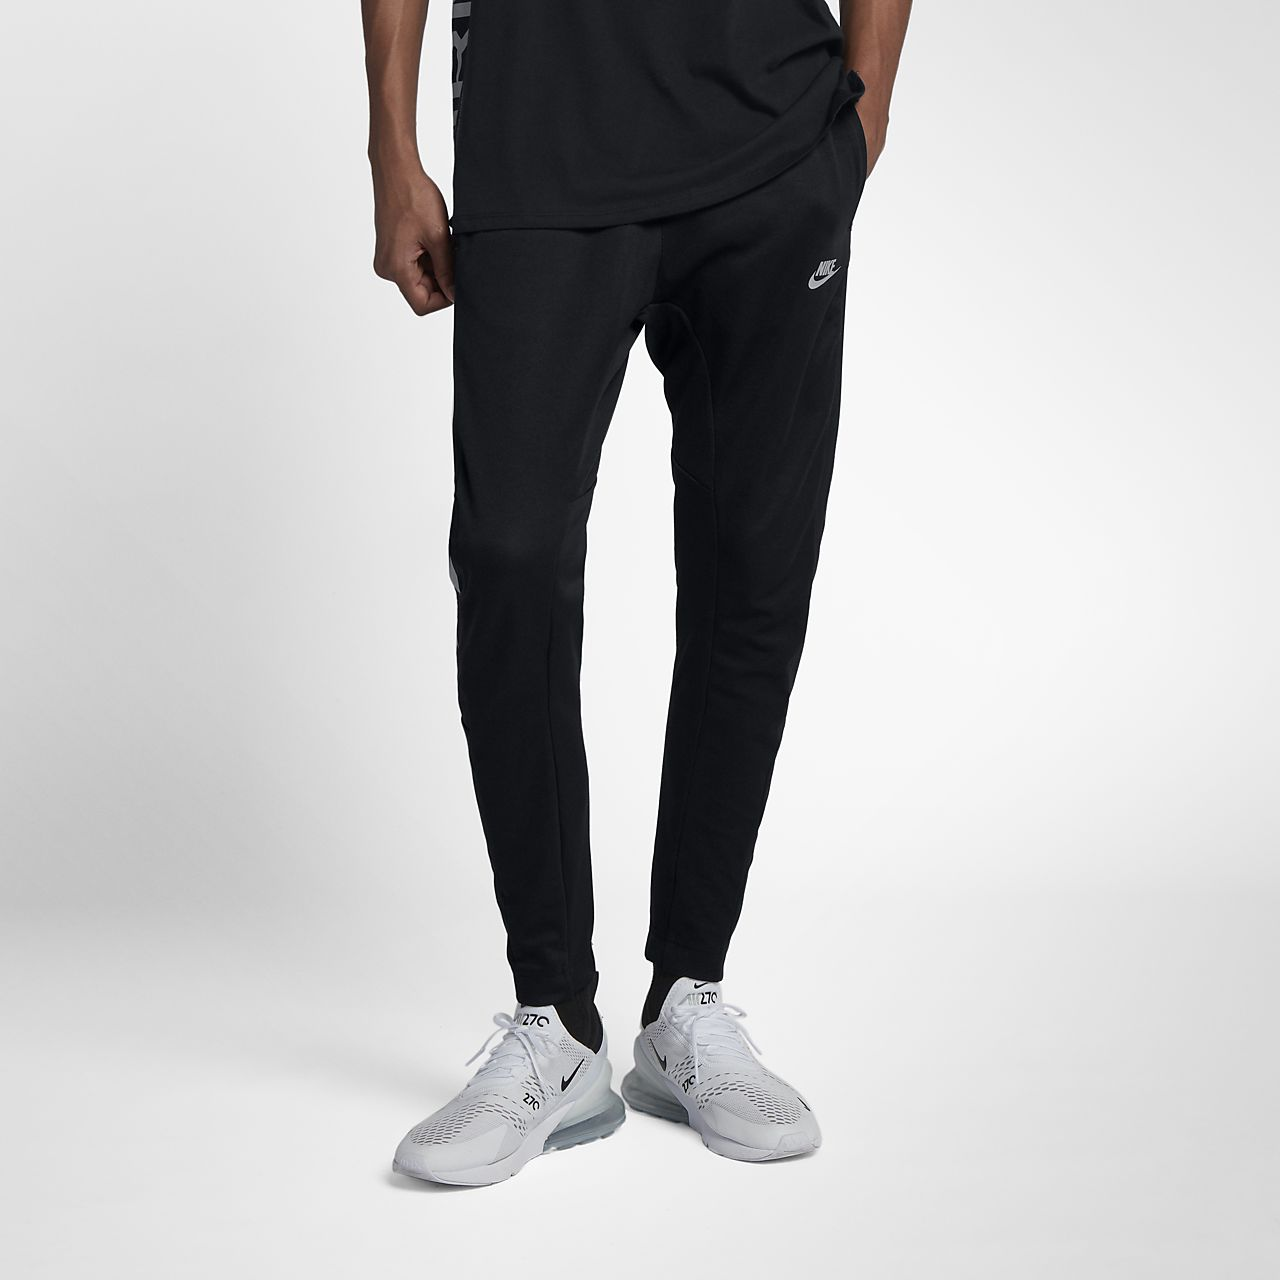 7d29304b30d Pantalon Nike Sportswear Air Max pour Homme. Nike.com FR